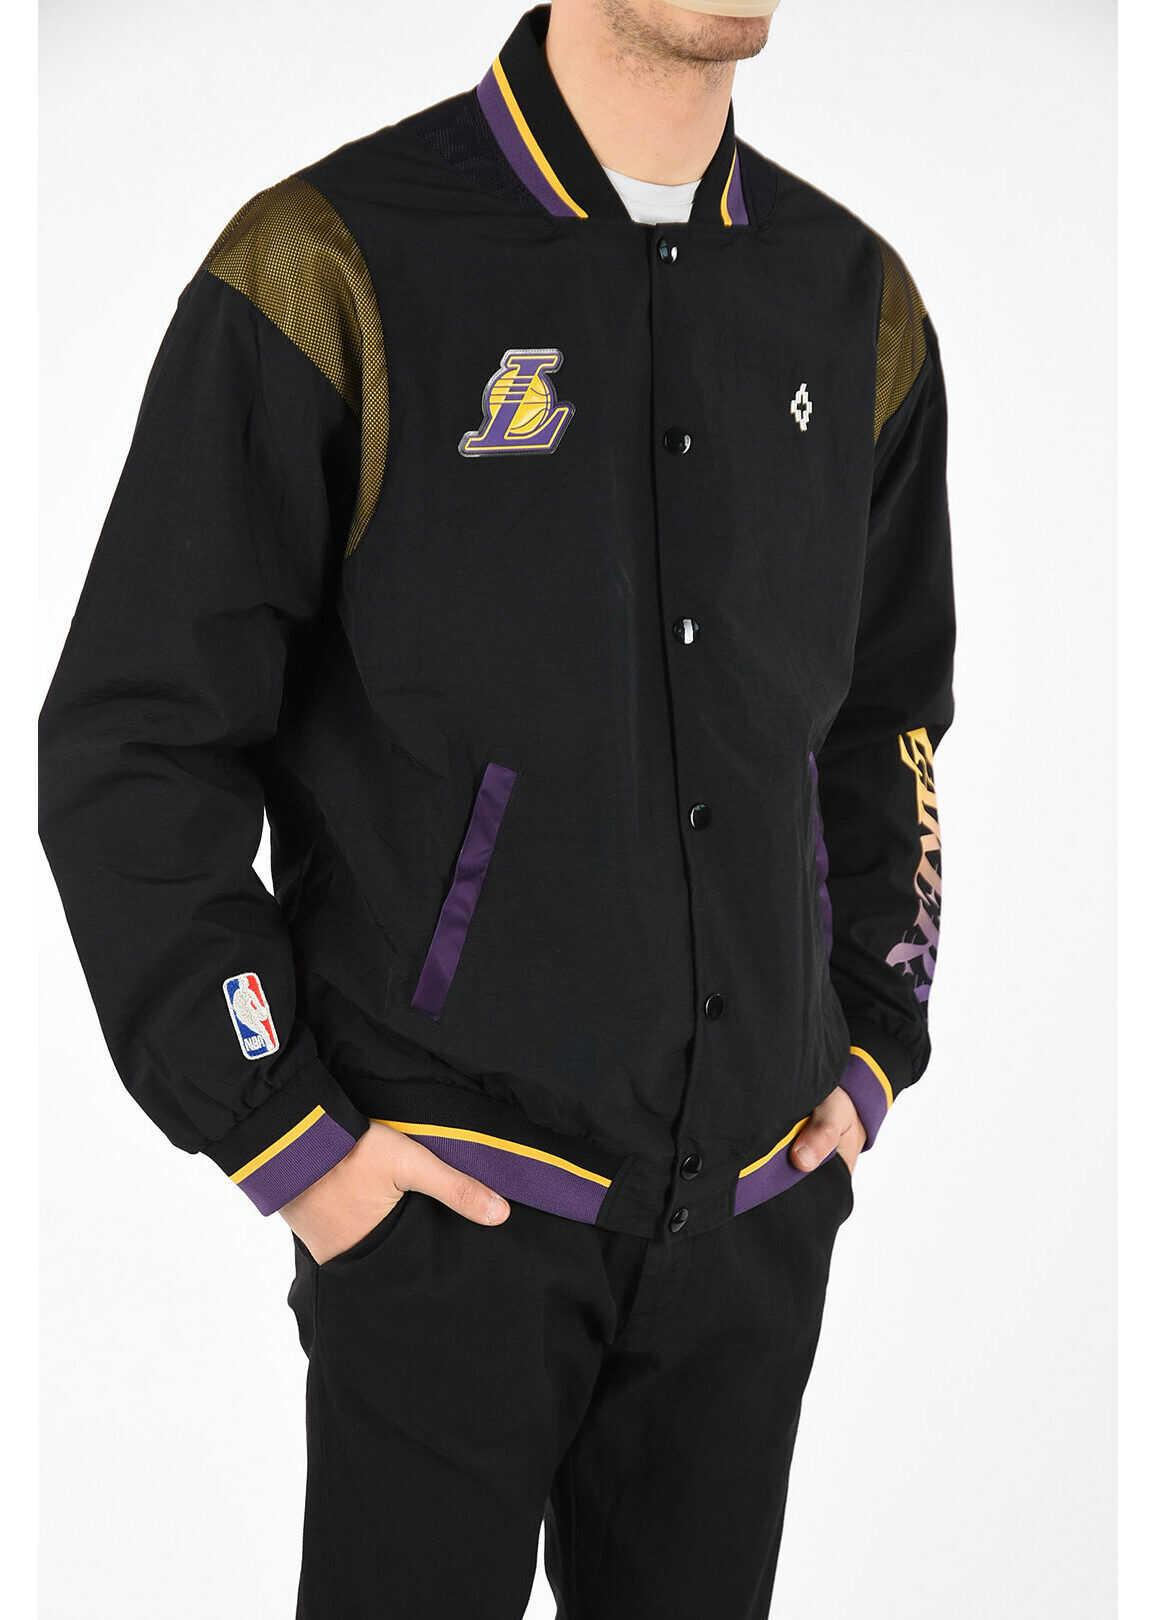 Marcelo Burlon NBA Snap Button LA LAKERS Varsity Jacket BLACK